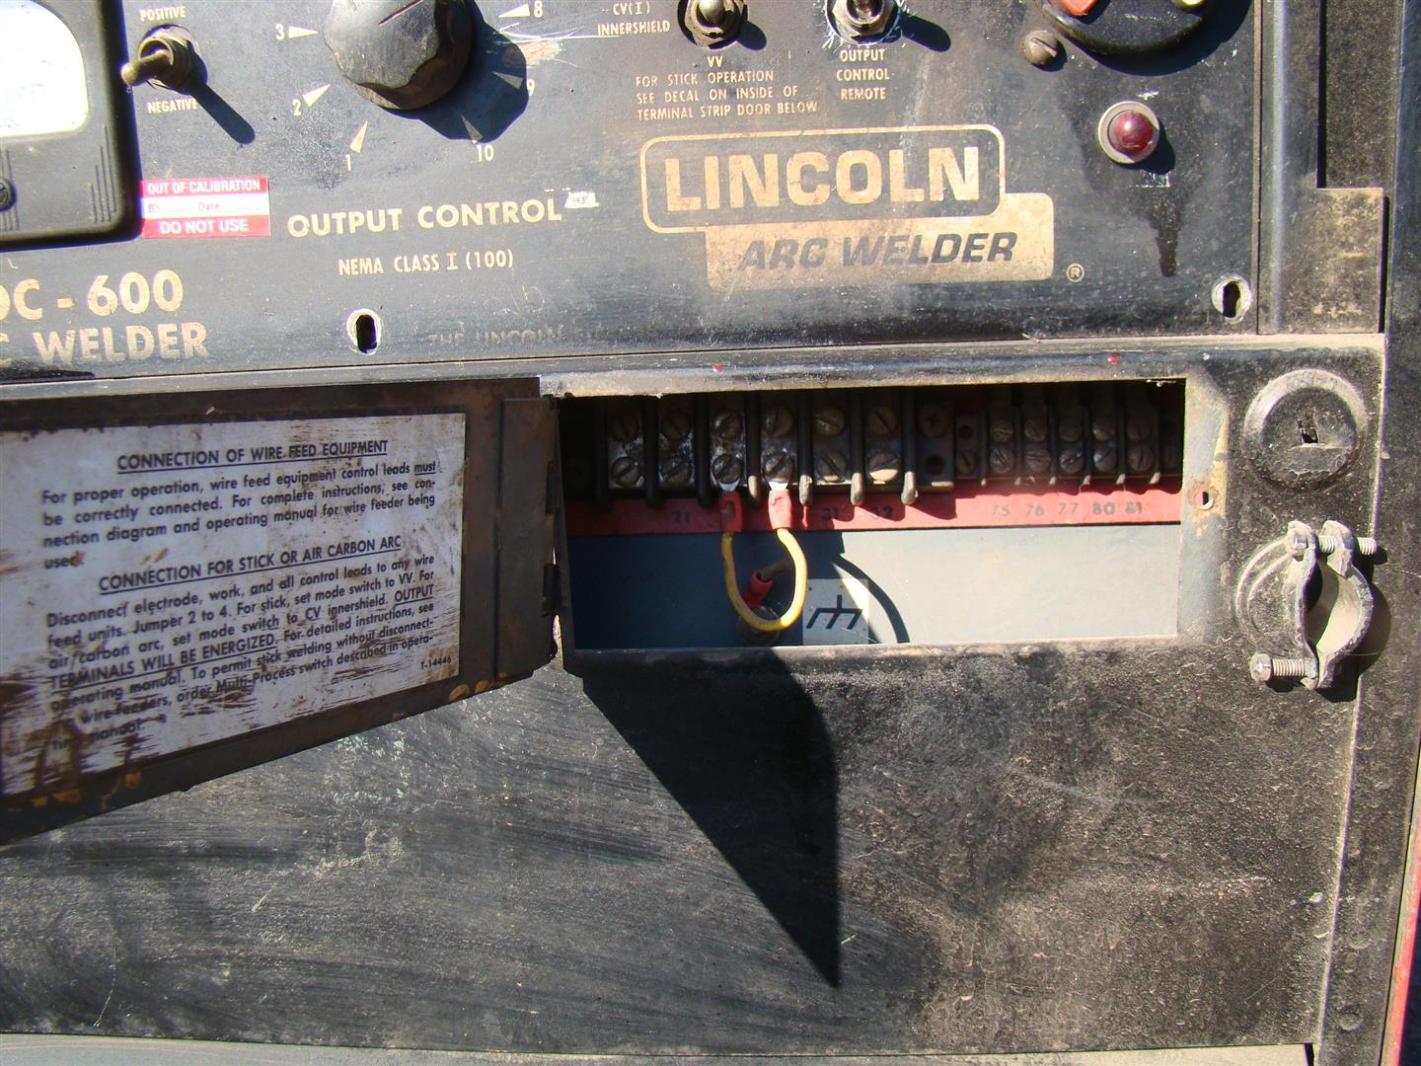 lincoln 225 arc welder wiring diagram honda civic idealarc dc 600 30 images